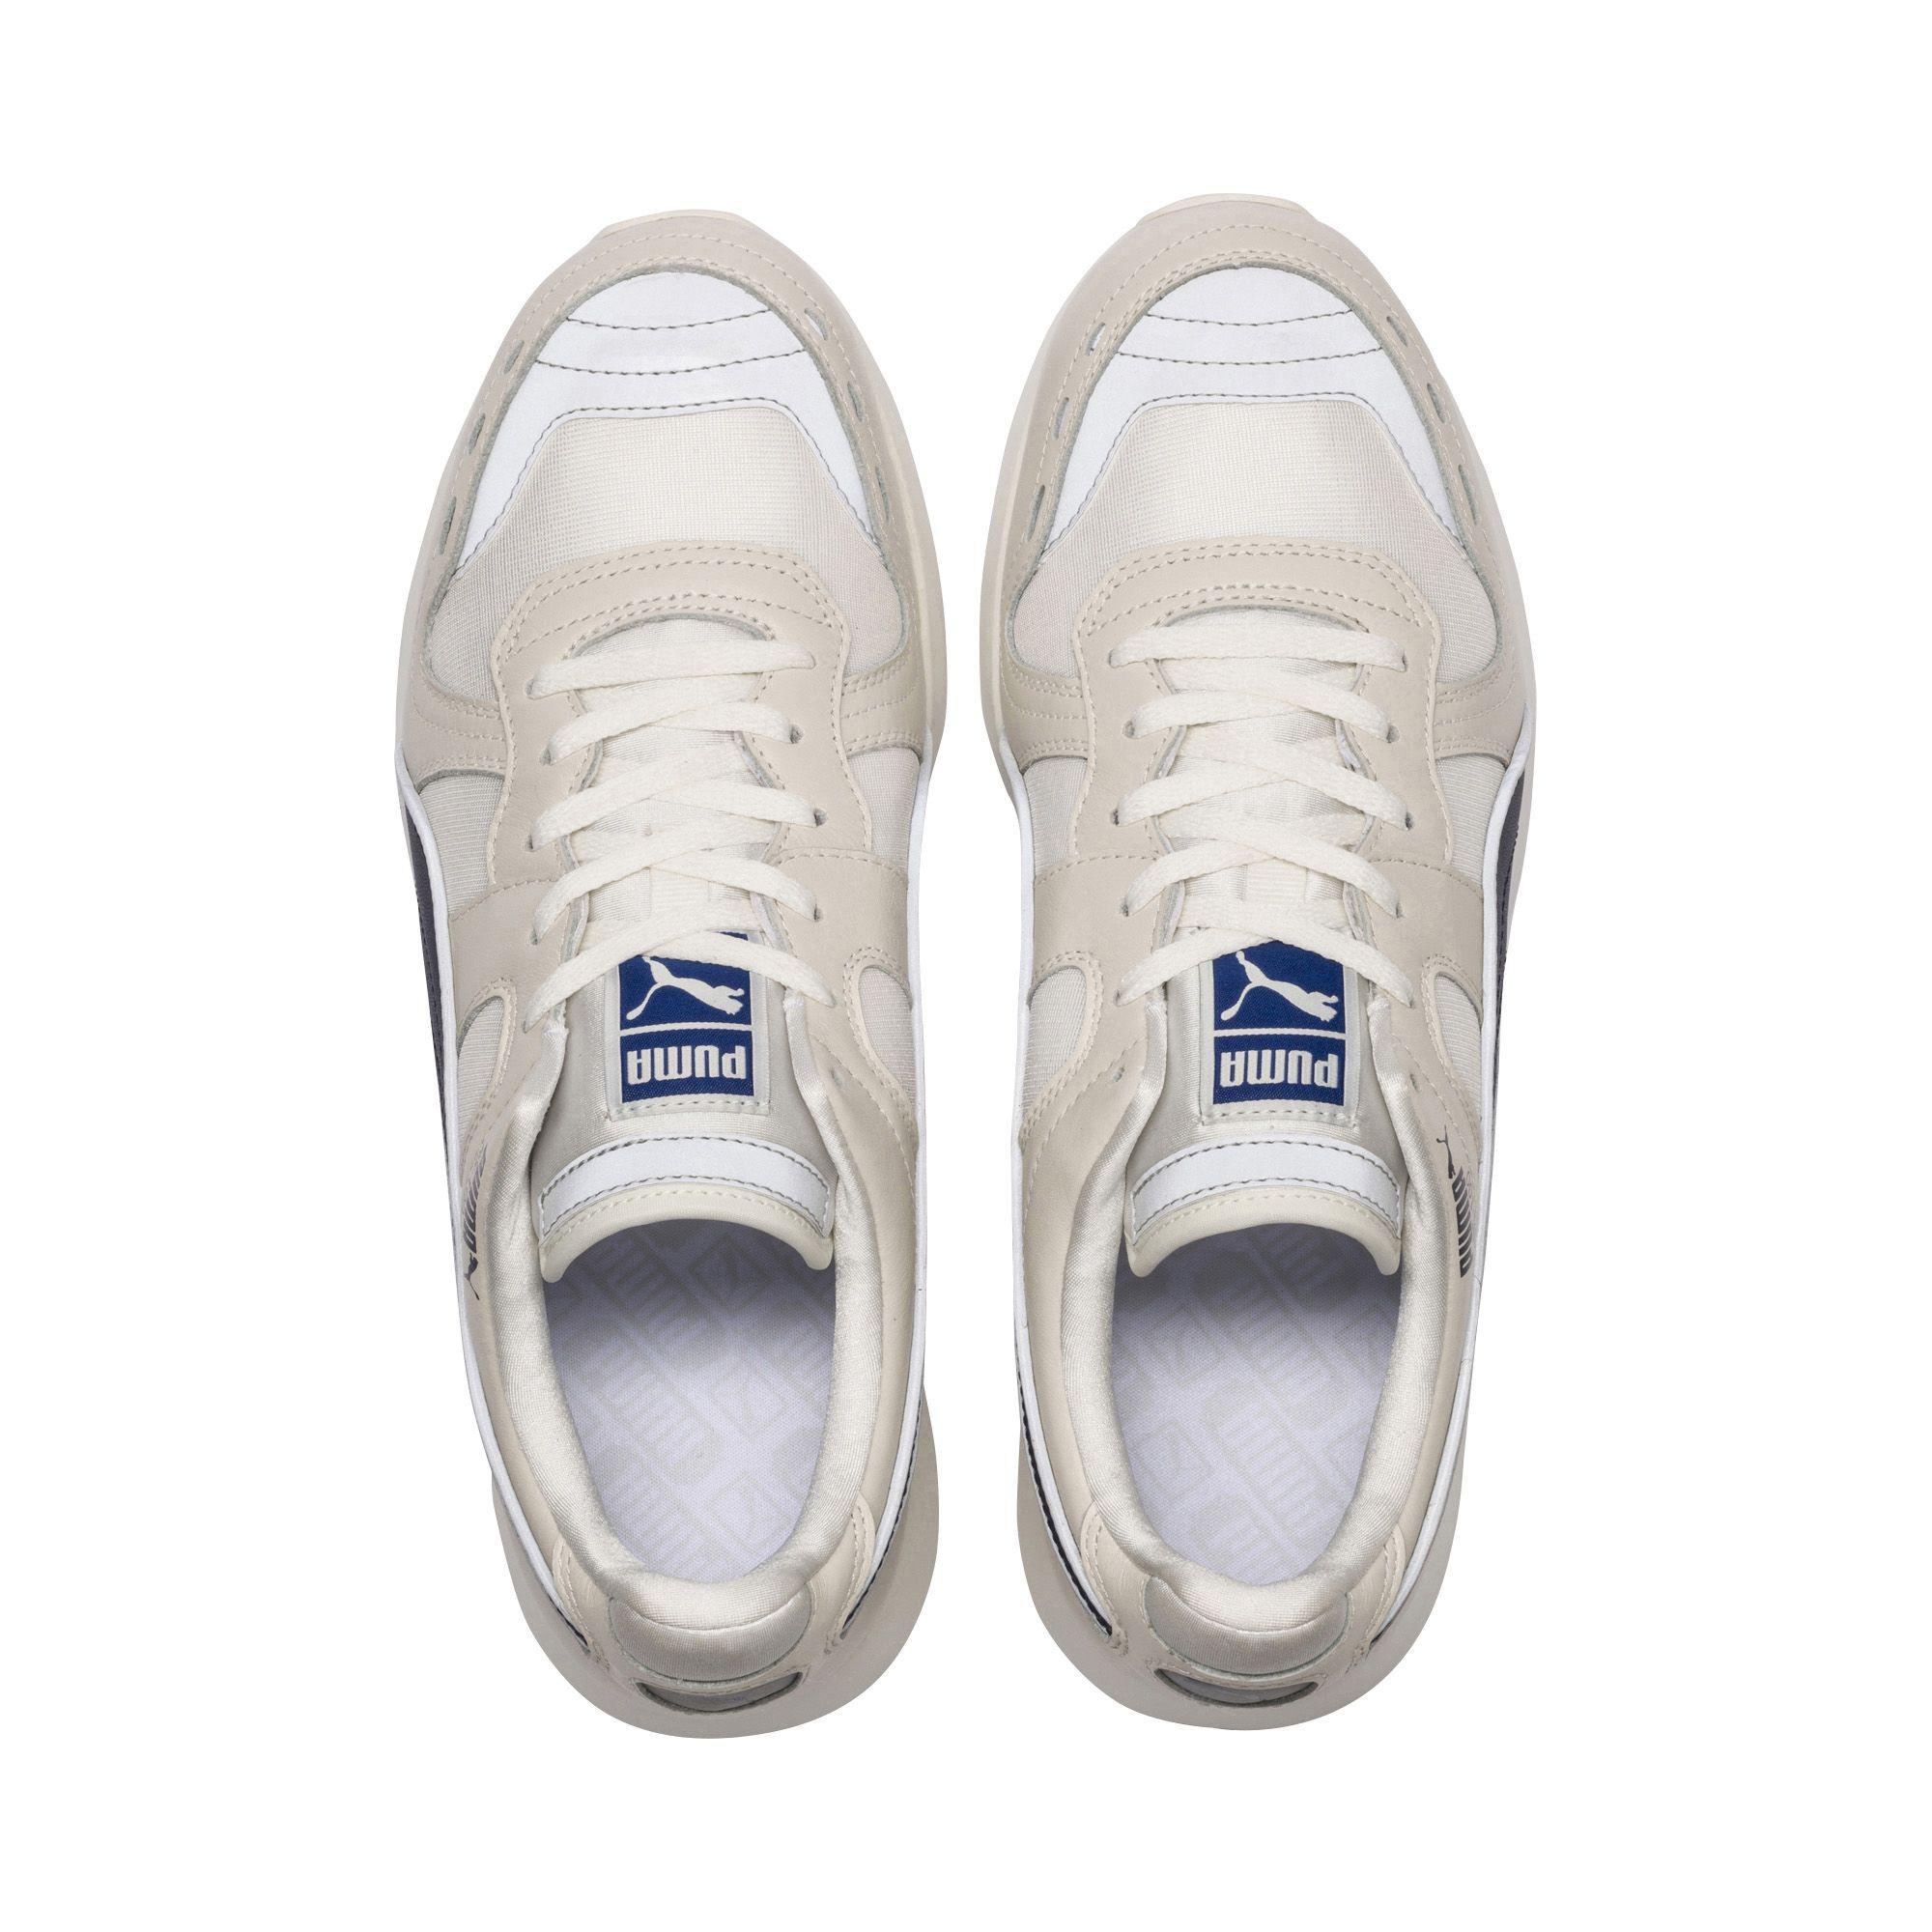 1541df6e22afa2 Lyst - PUMA Rs-100 Pc Sneakers for Men